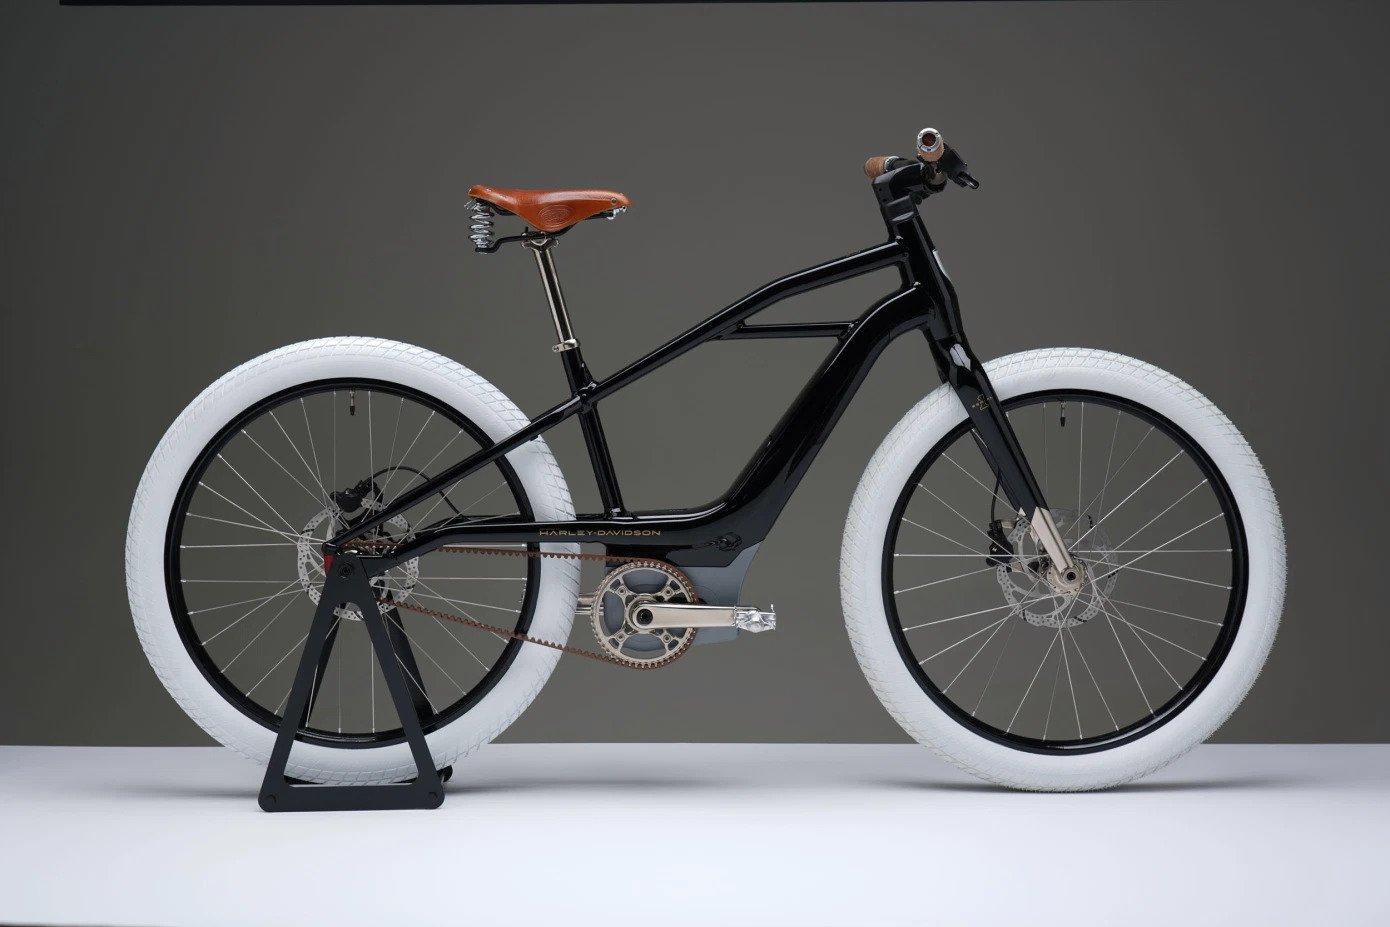 H D bike - Harley-Davidson τώρα και ηλεκτρικά ποδήλατα